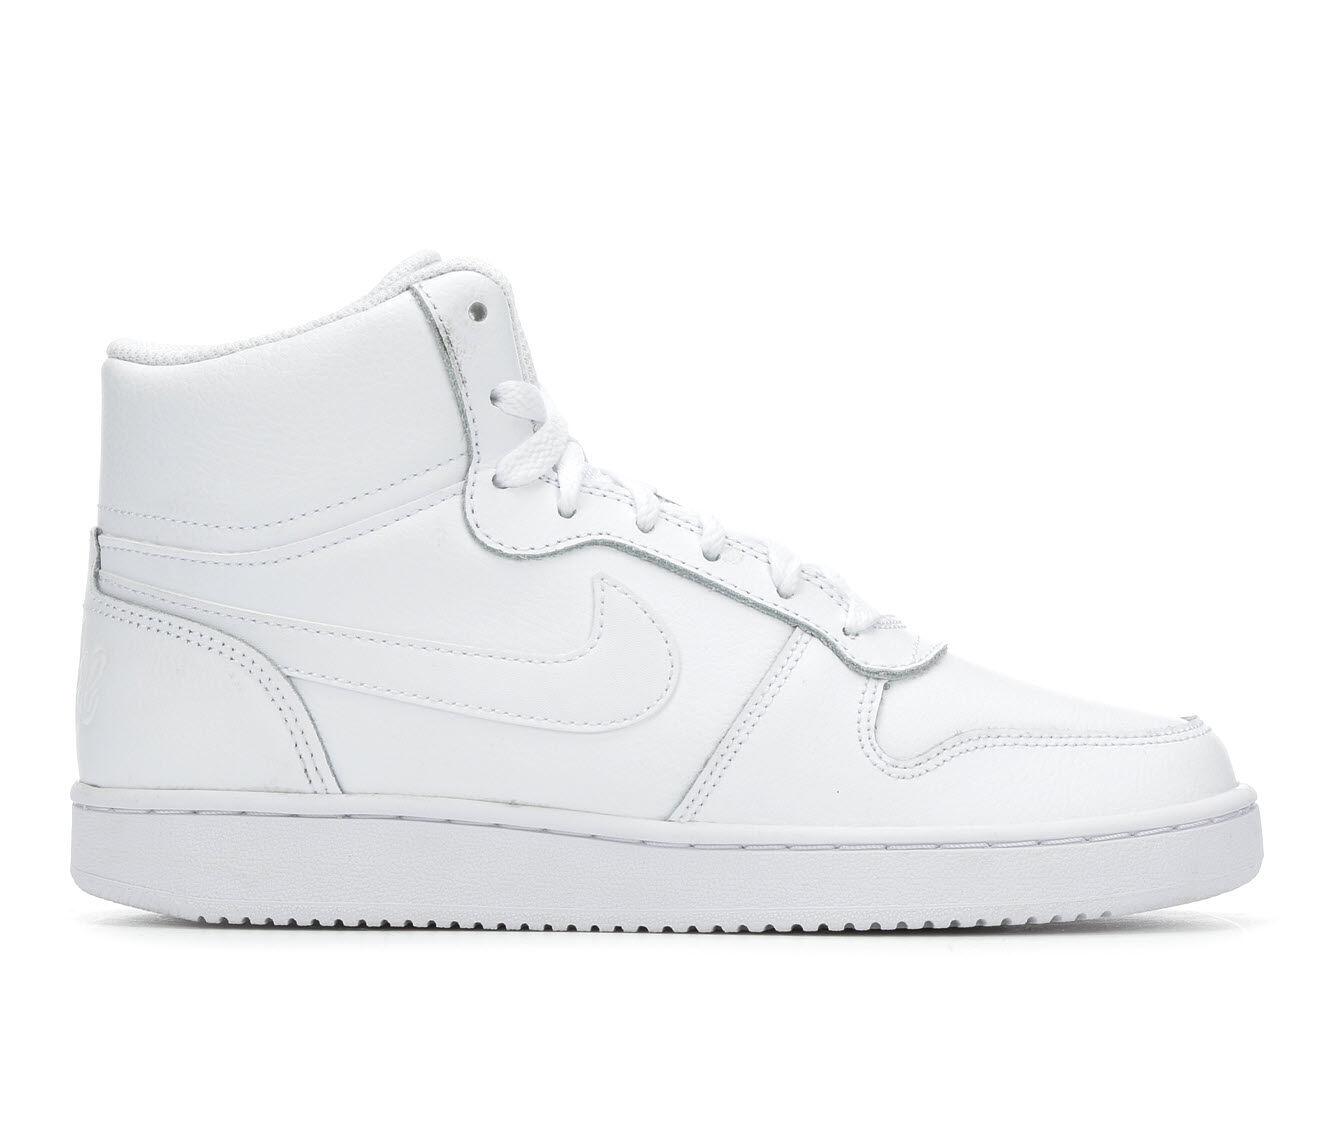 Women's Nike Ebernon Mid Fashion Basketball Shoes